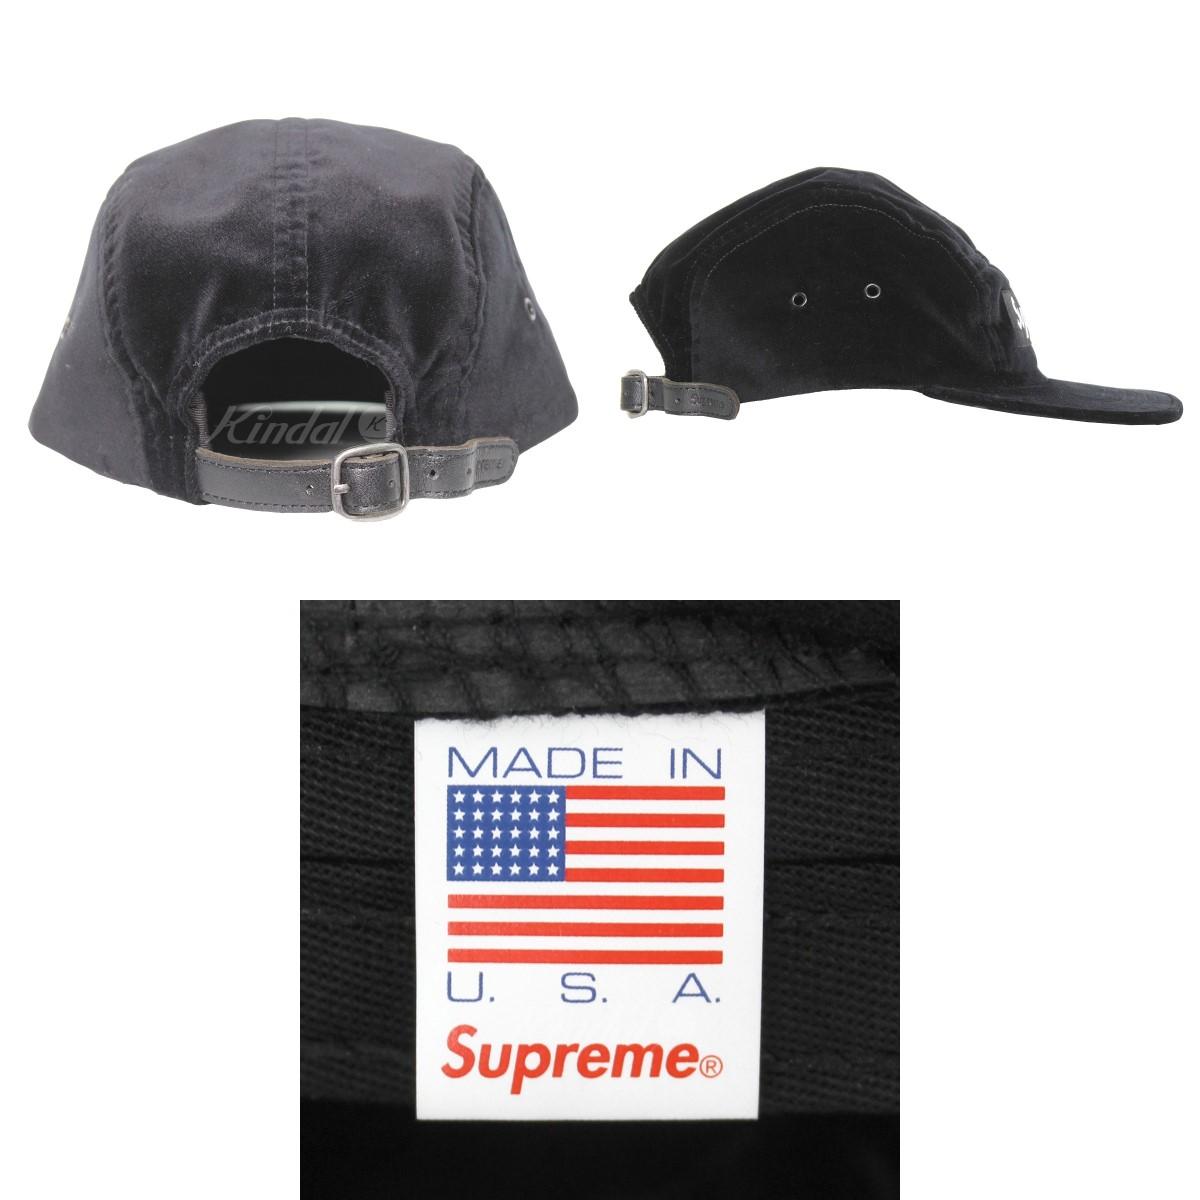 7c5ec5a0 ... SUPREME 18AW Velvet Camp Cap velvet camping cap black size: - Supreme  ...